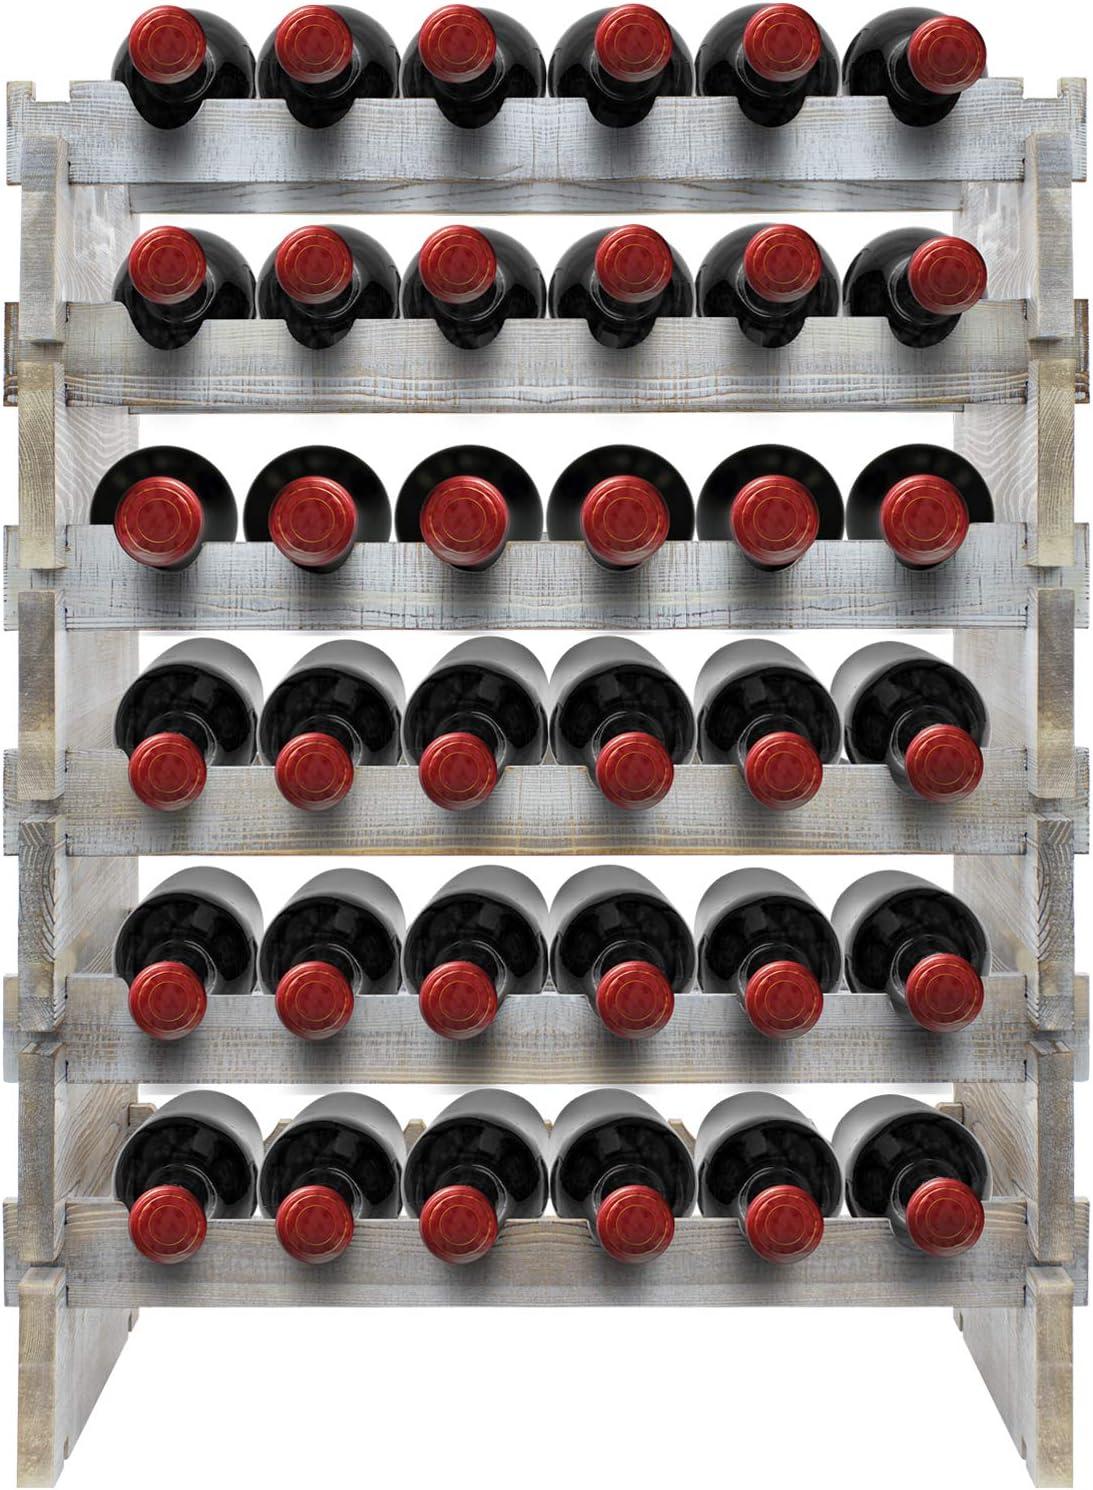 Sorbus Stackable Wood Wine Rack — Rustic Style Wine Racks for Bottles — Perfect for Bar, Wine Cellar, Basement, Cabinet, Pantry, etc. (6-Tier, Grey Wood)